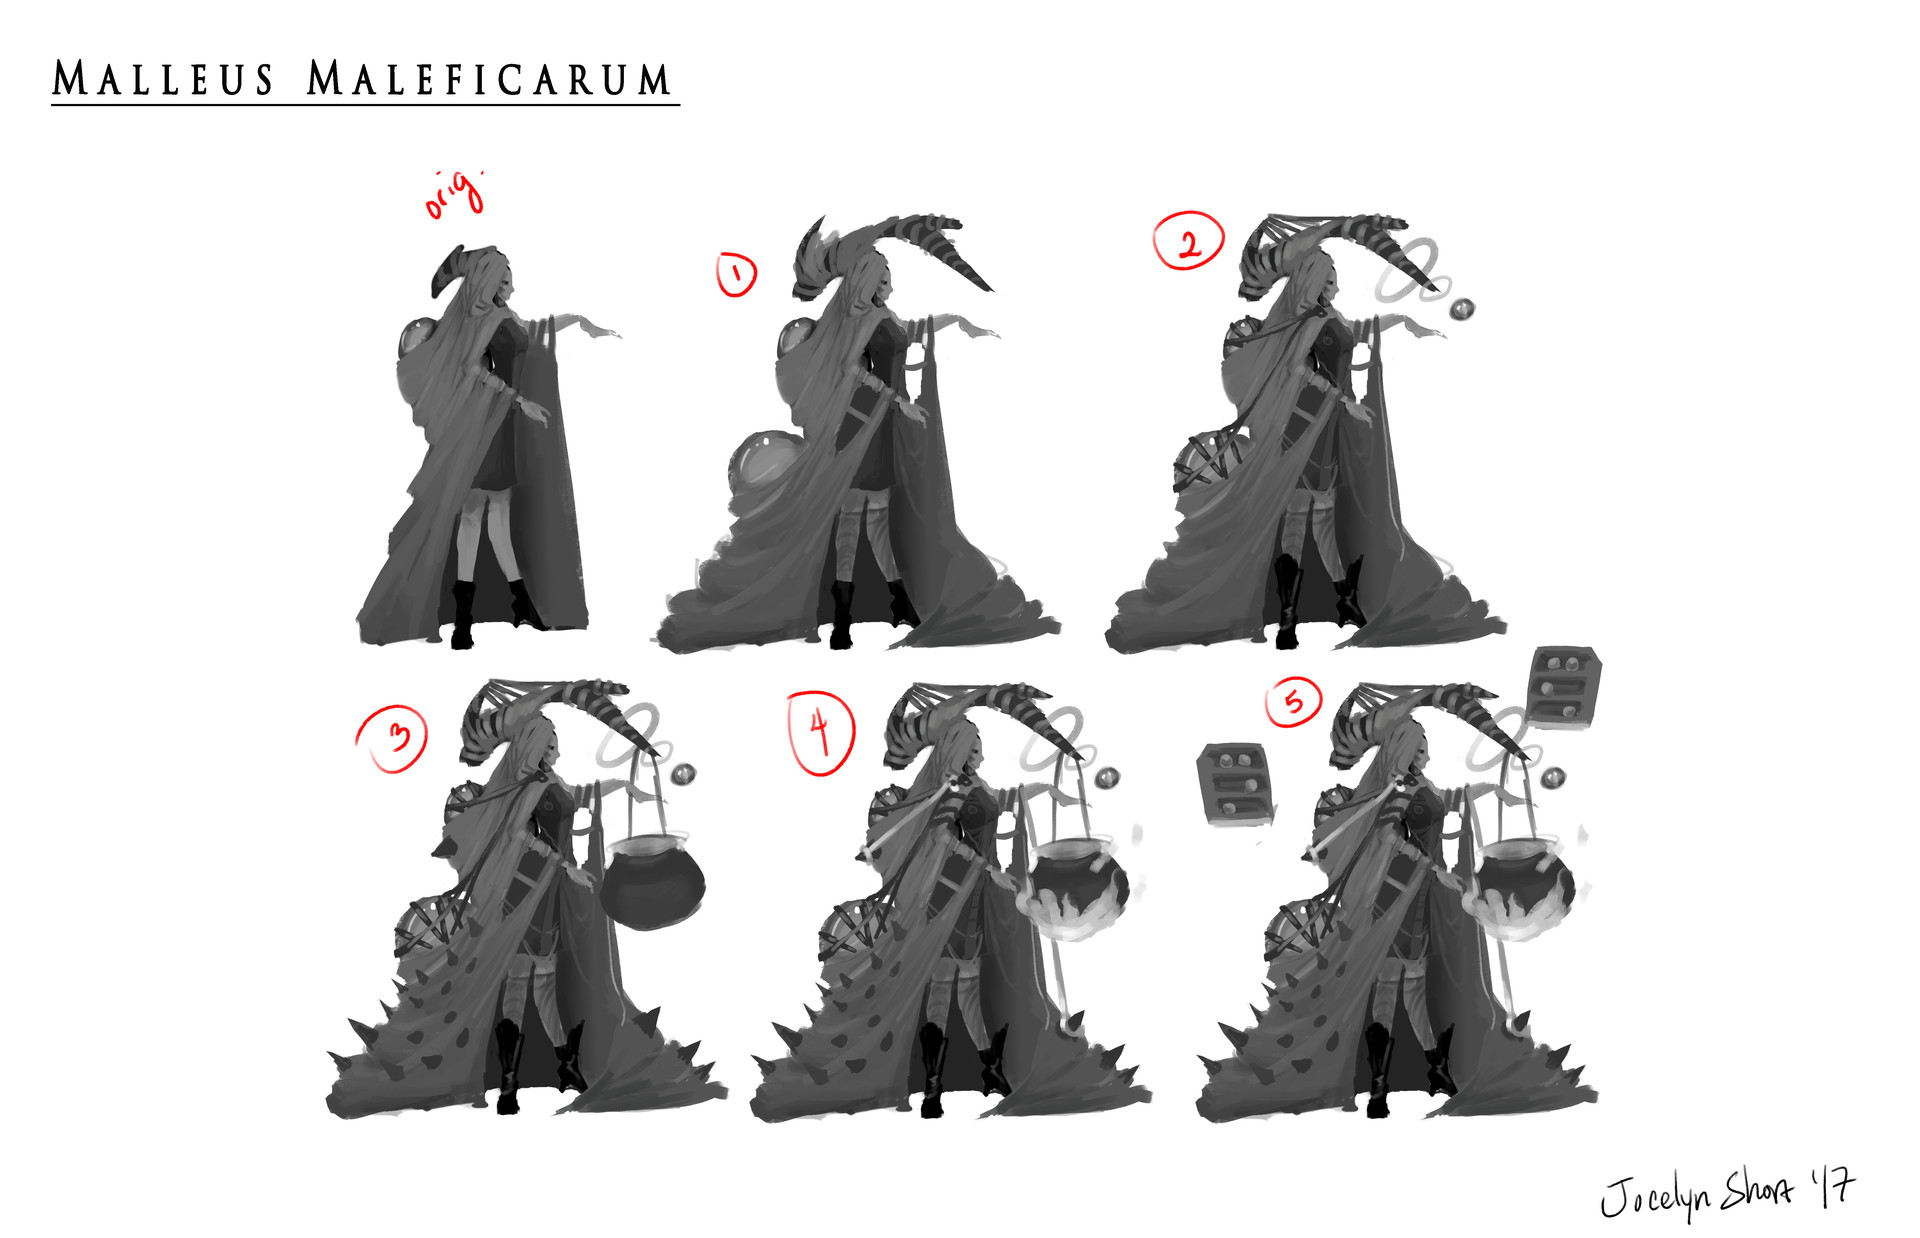 Jocelyn short witch 4 level up